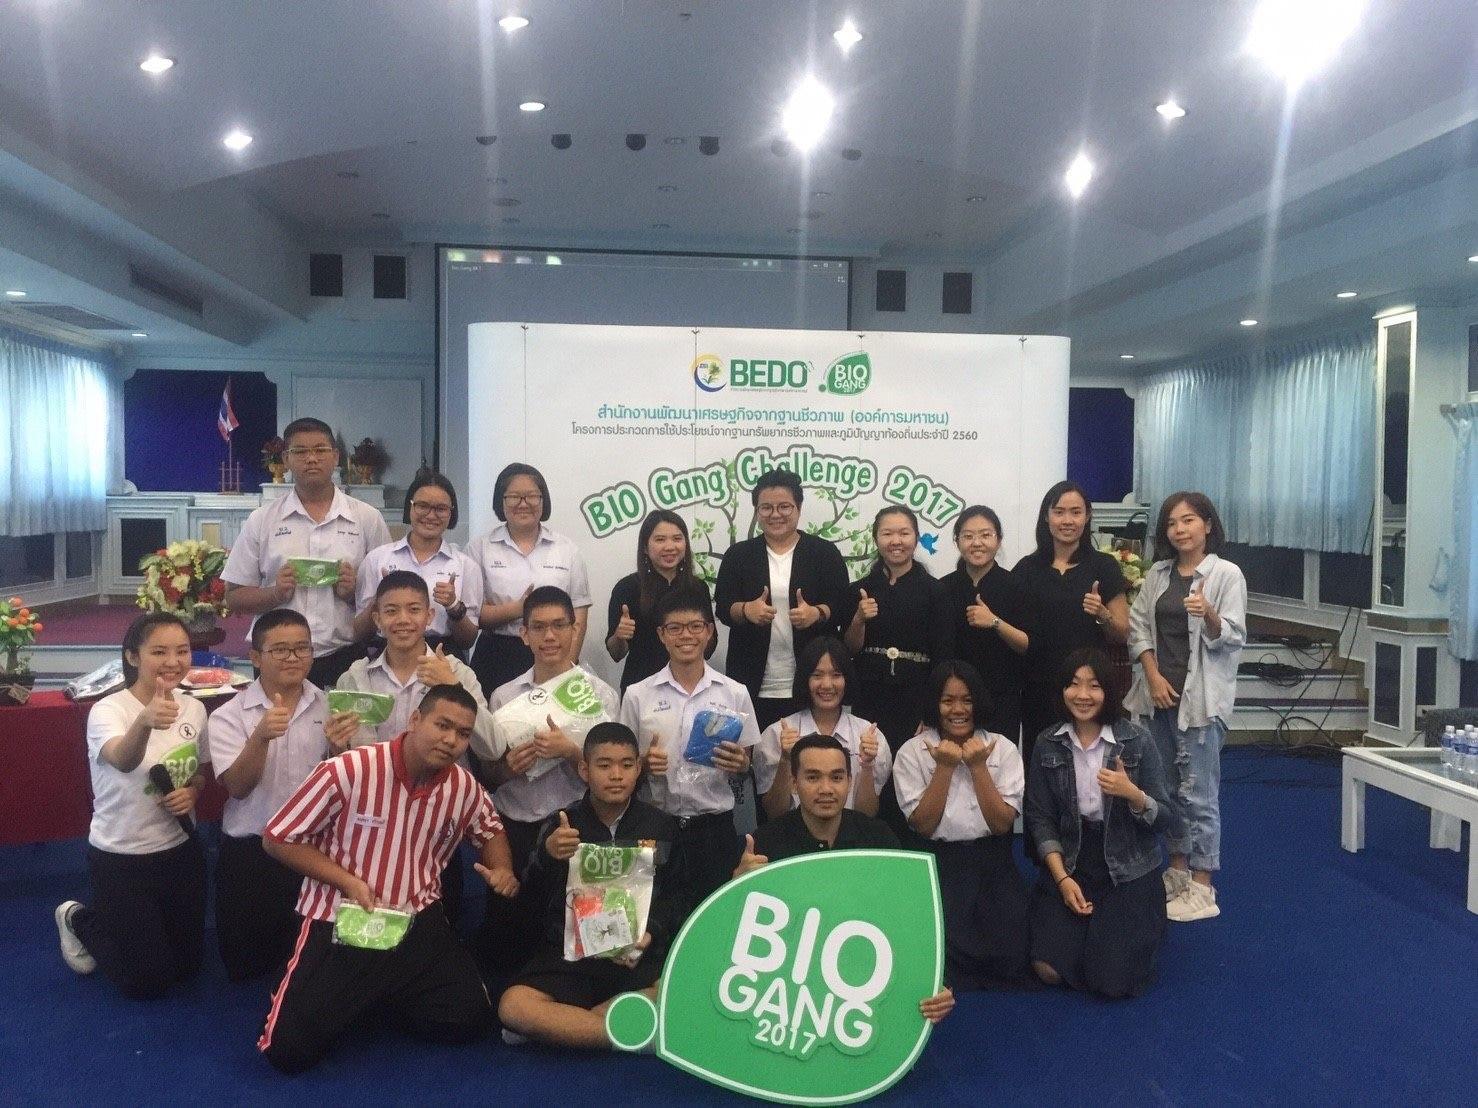 Bio Gang 2017 ชวนร่วมกิจกรรมประกวดสวนพฤกษศาสตร์